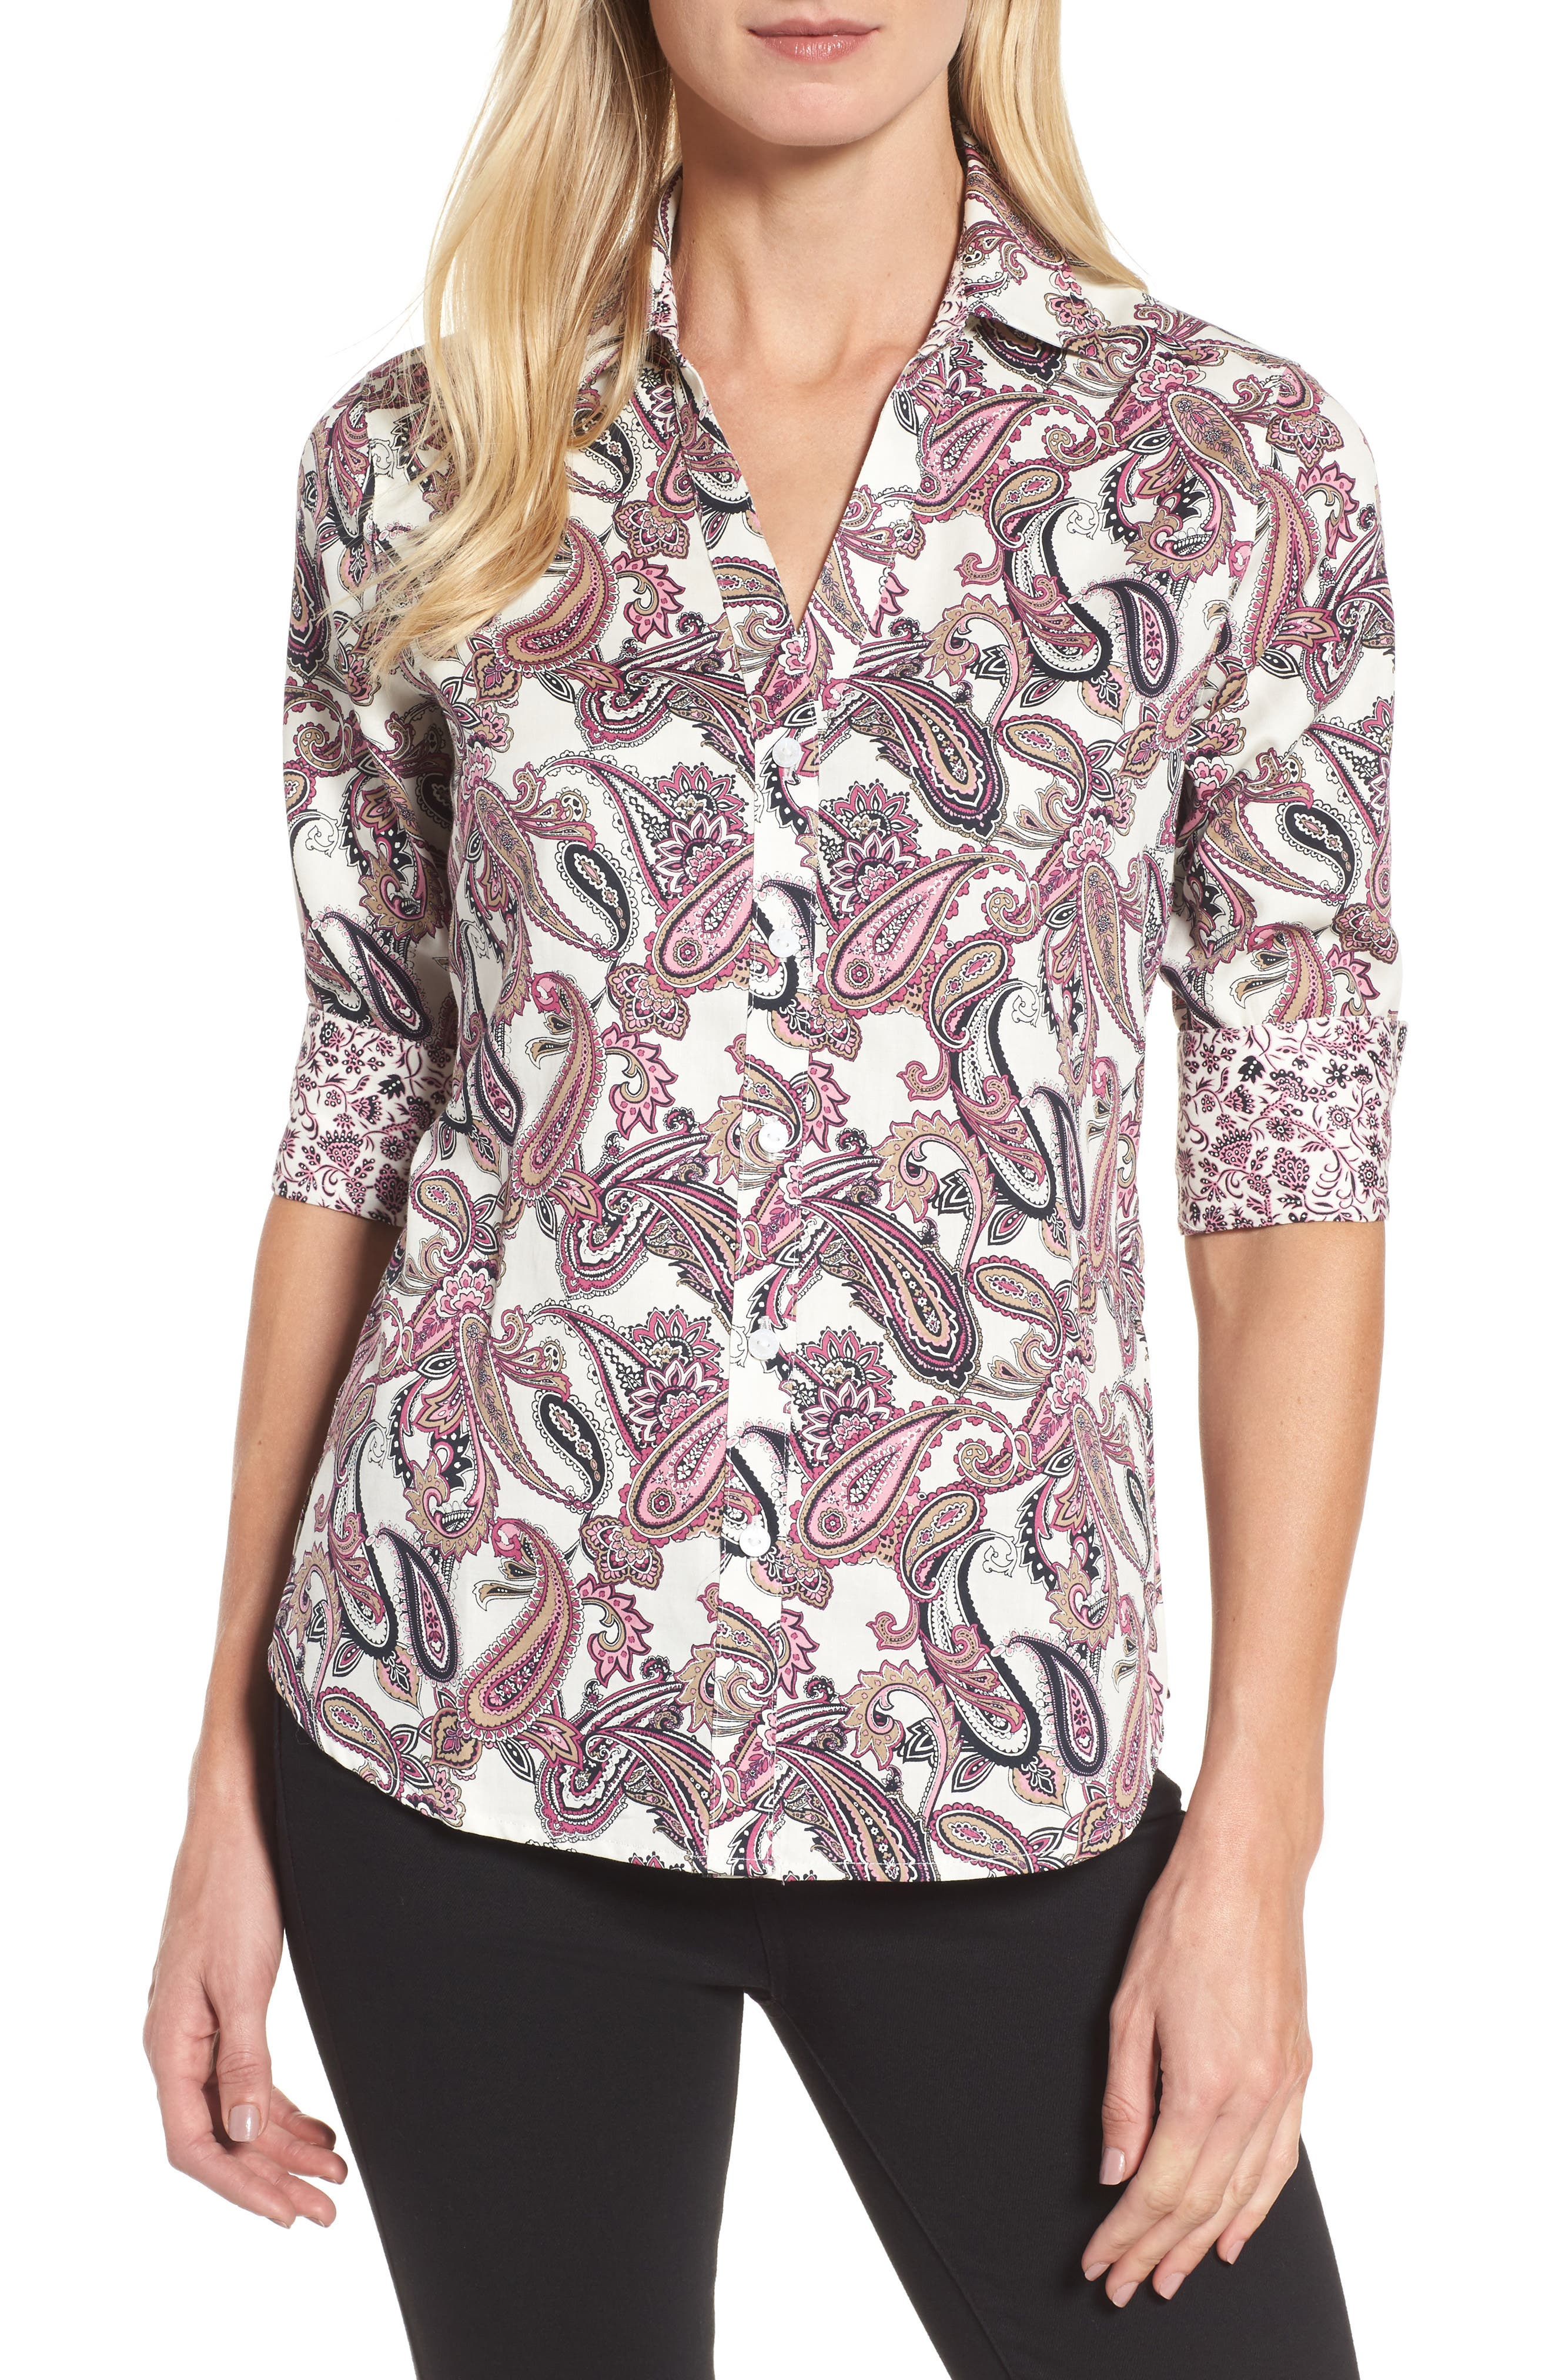 Mary Paisley Wrinkle Free Shirt,                         Main,                         color, 935